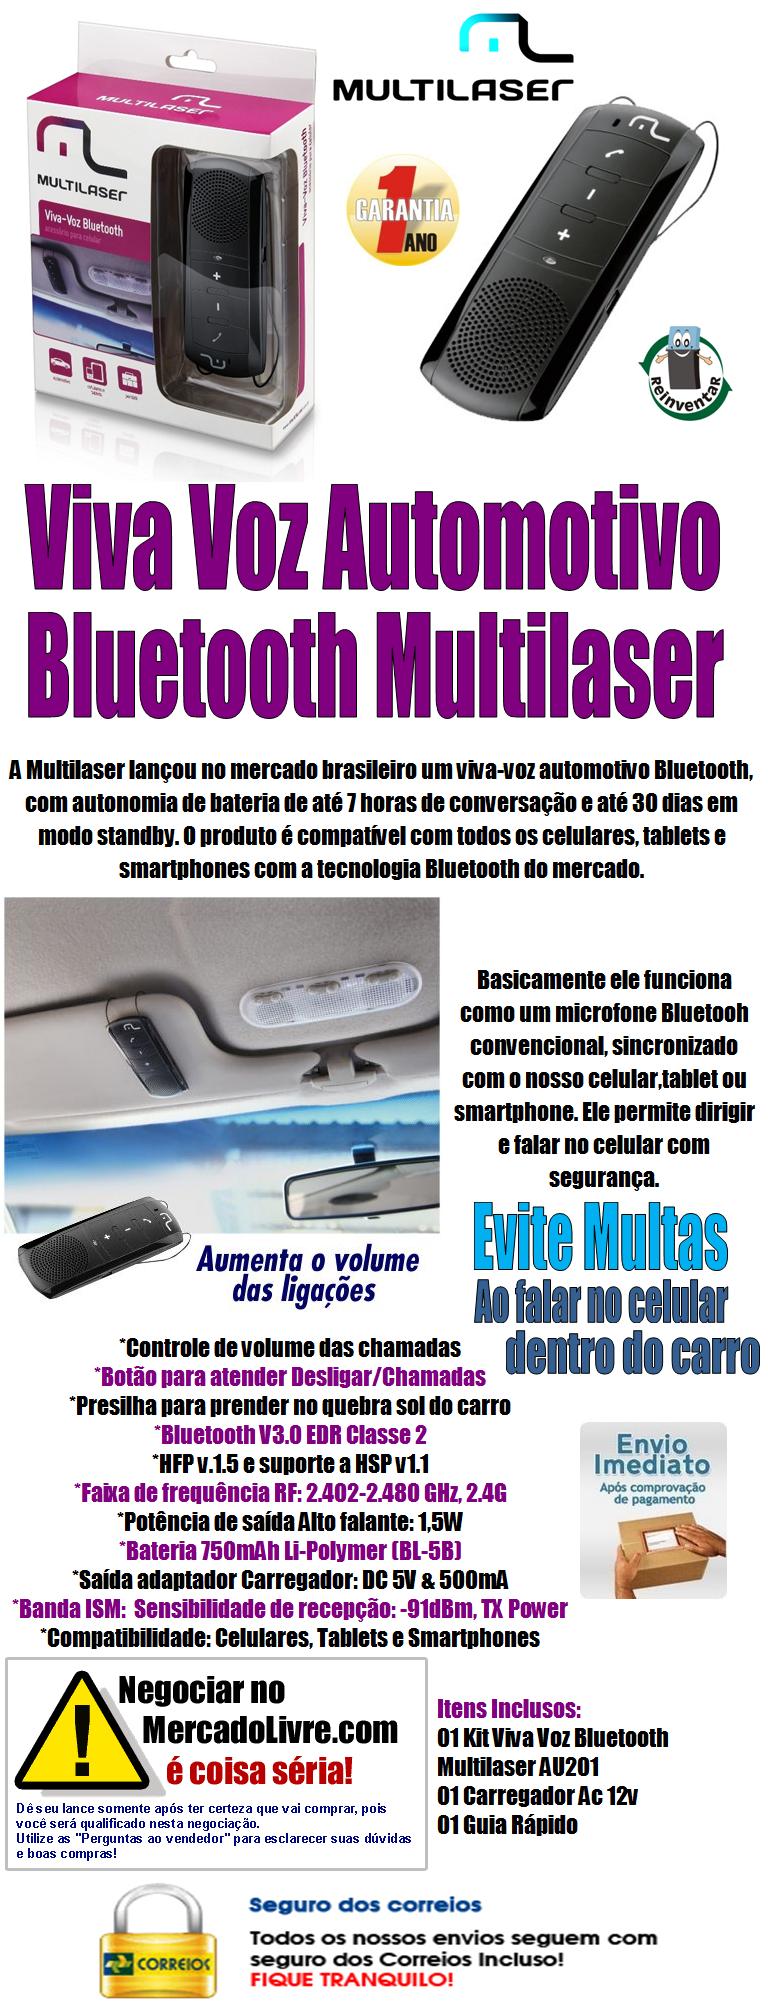 AU201 Multilaser/Reinventar D. Aut.